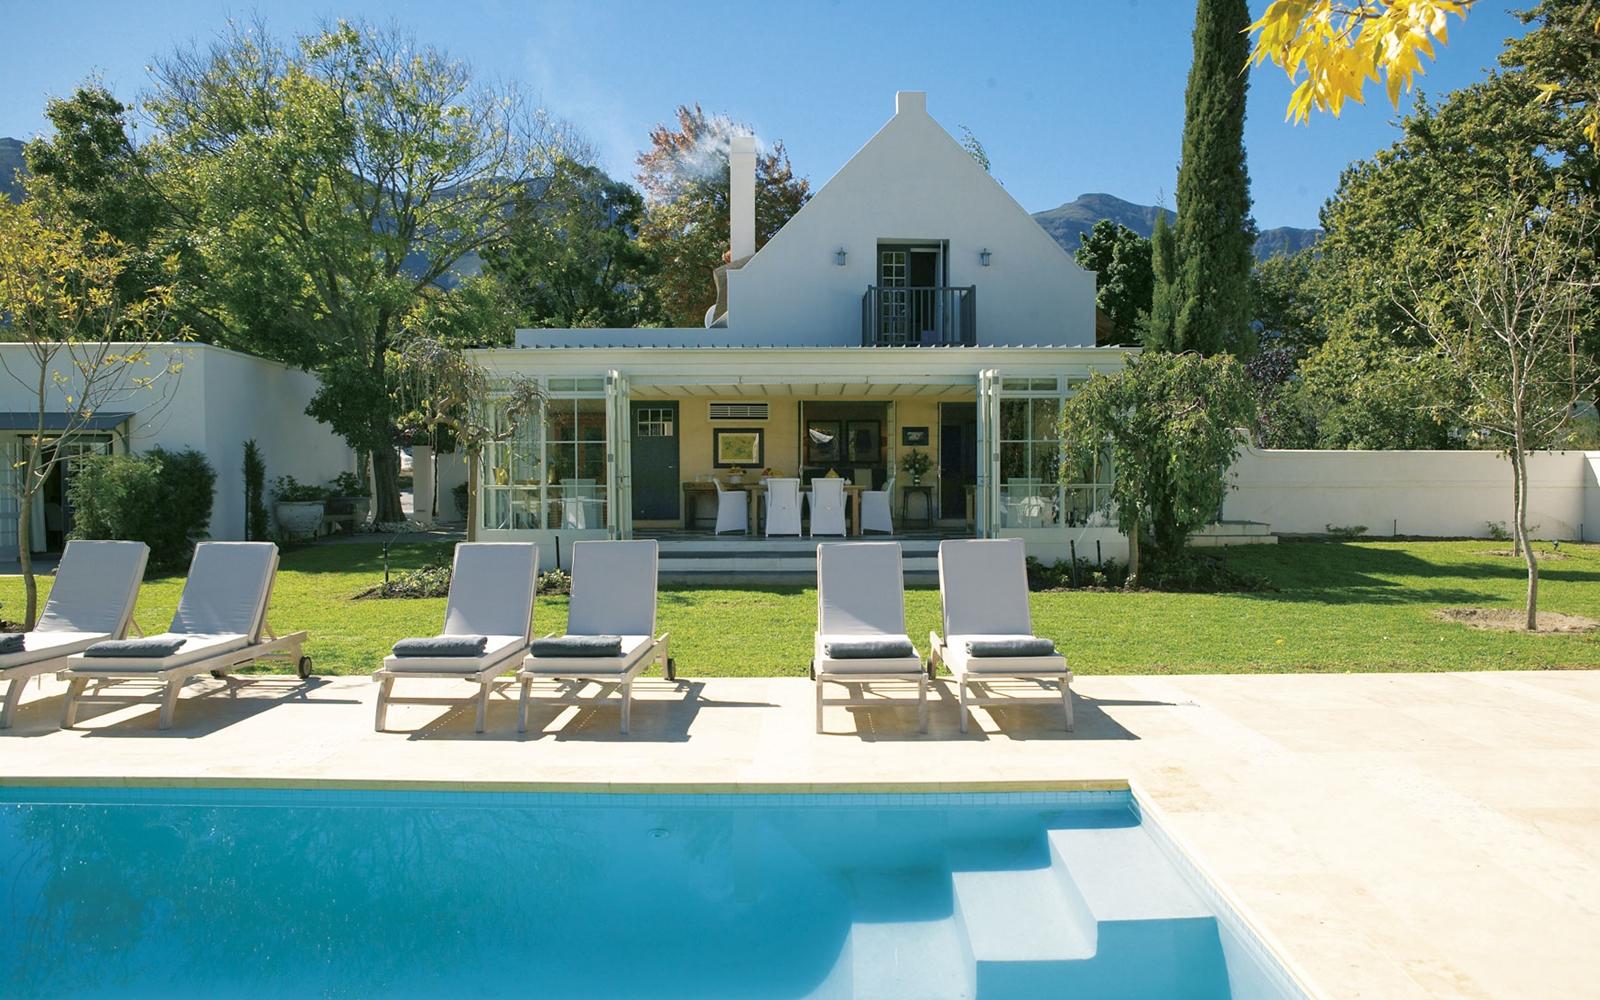 20-The-Owners-Cottage-HERO-exterior_Rotator.CPGakA.jpg